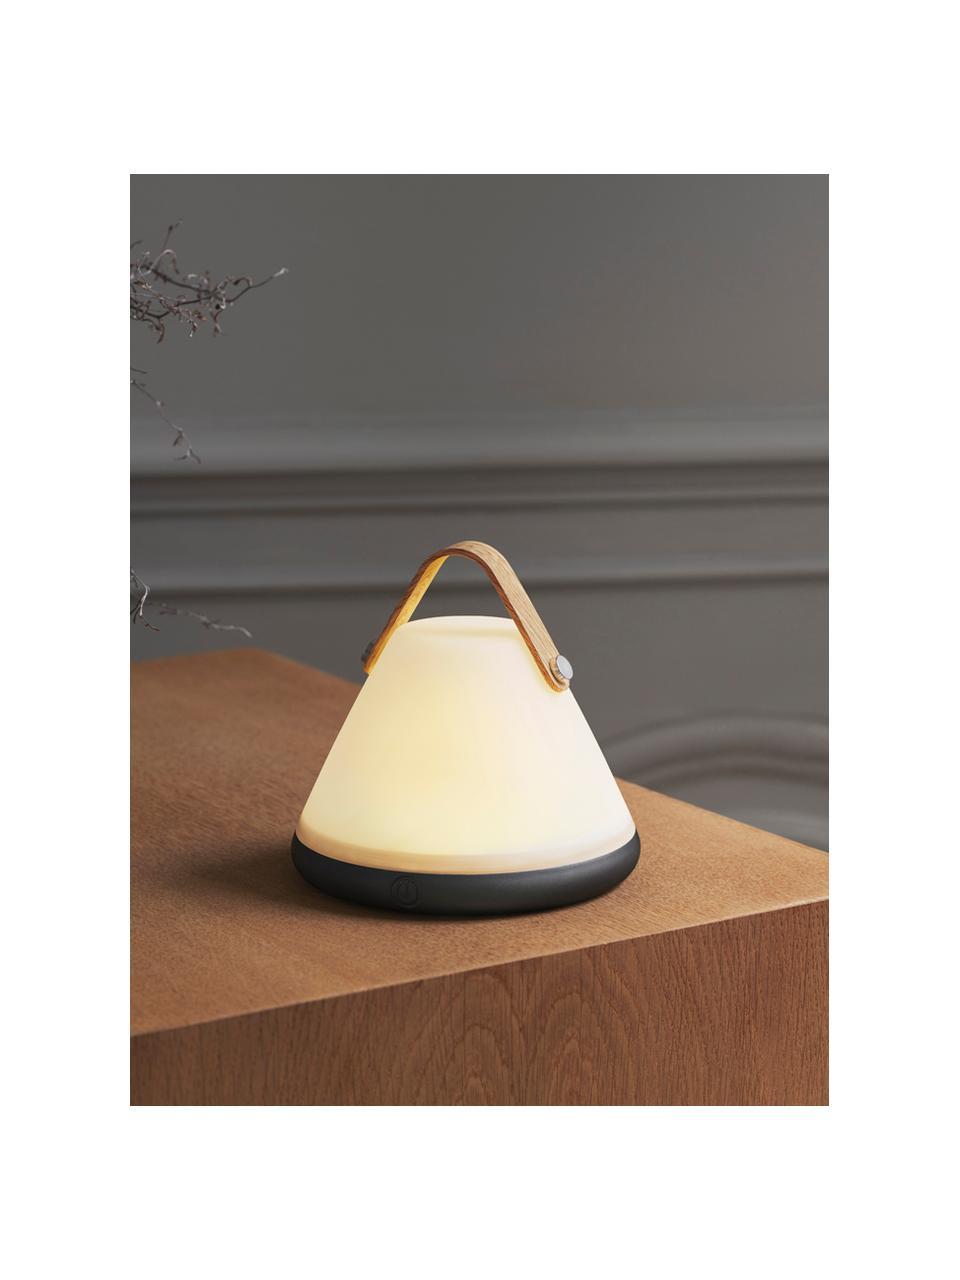 Kleine Mobile Dimmbare Tischlampe Move, Lampenschirm: Kunststoff, Lampenfuß: Kunststoff, Griff: Holz, Dekor: Metall, Weiß, Schwarz, Holz, Ø 15 x H 15 cm